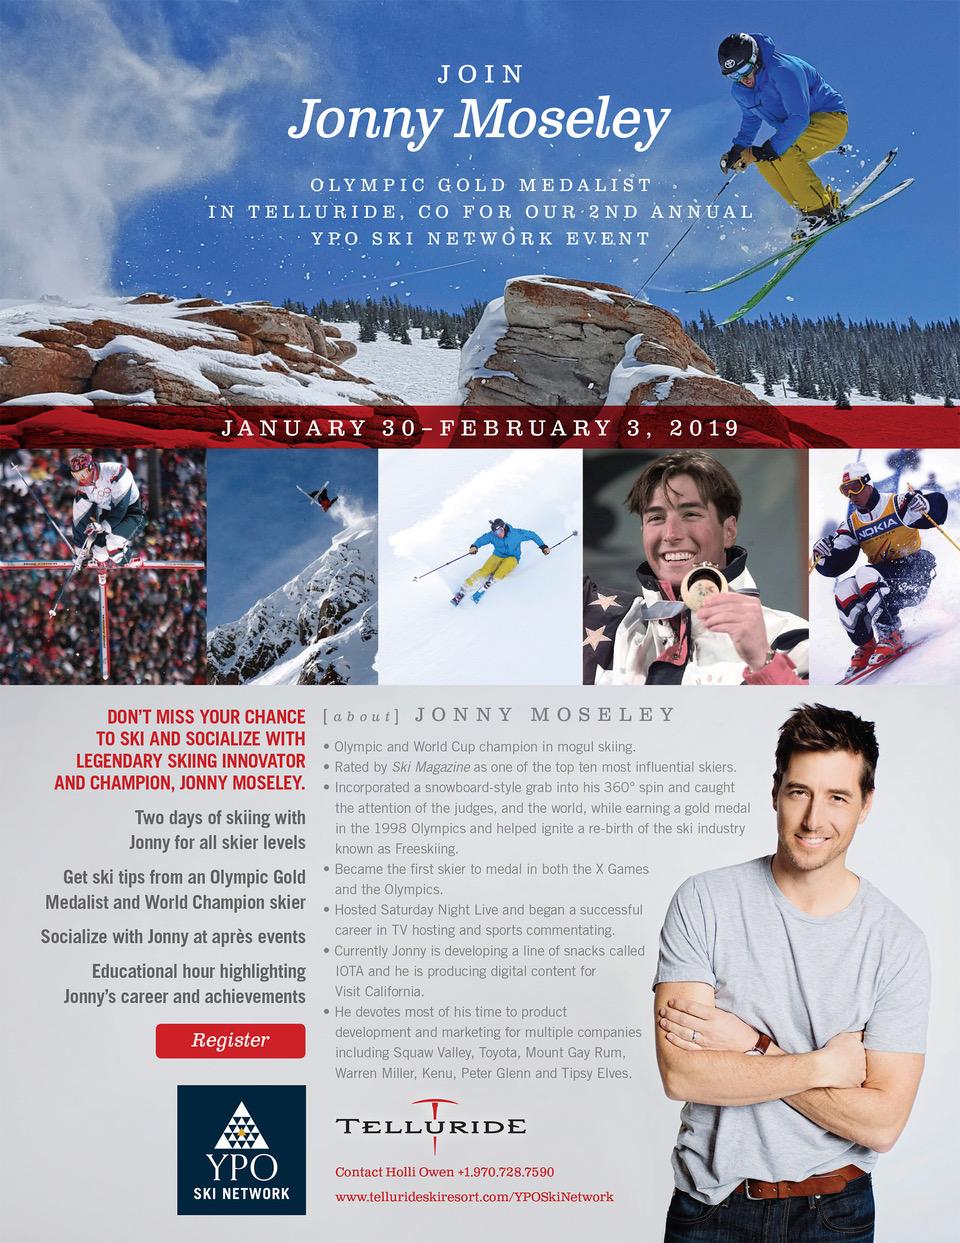 Jonny Moseley